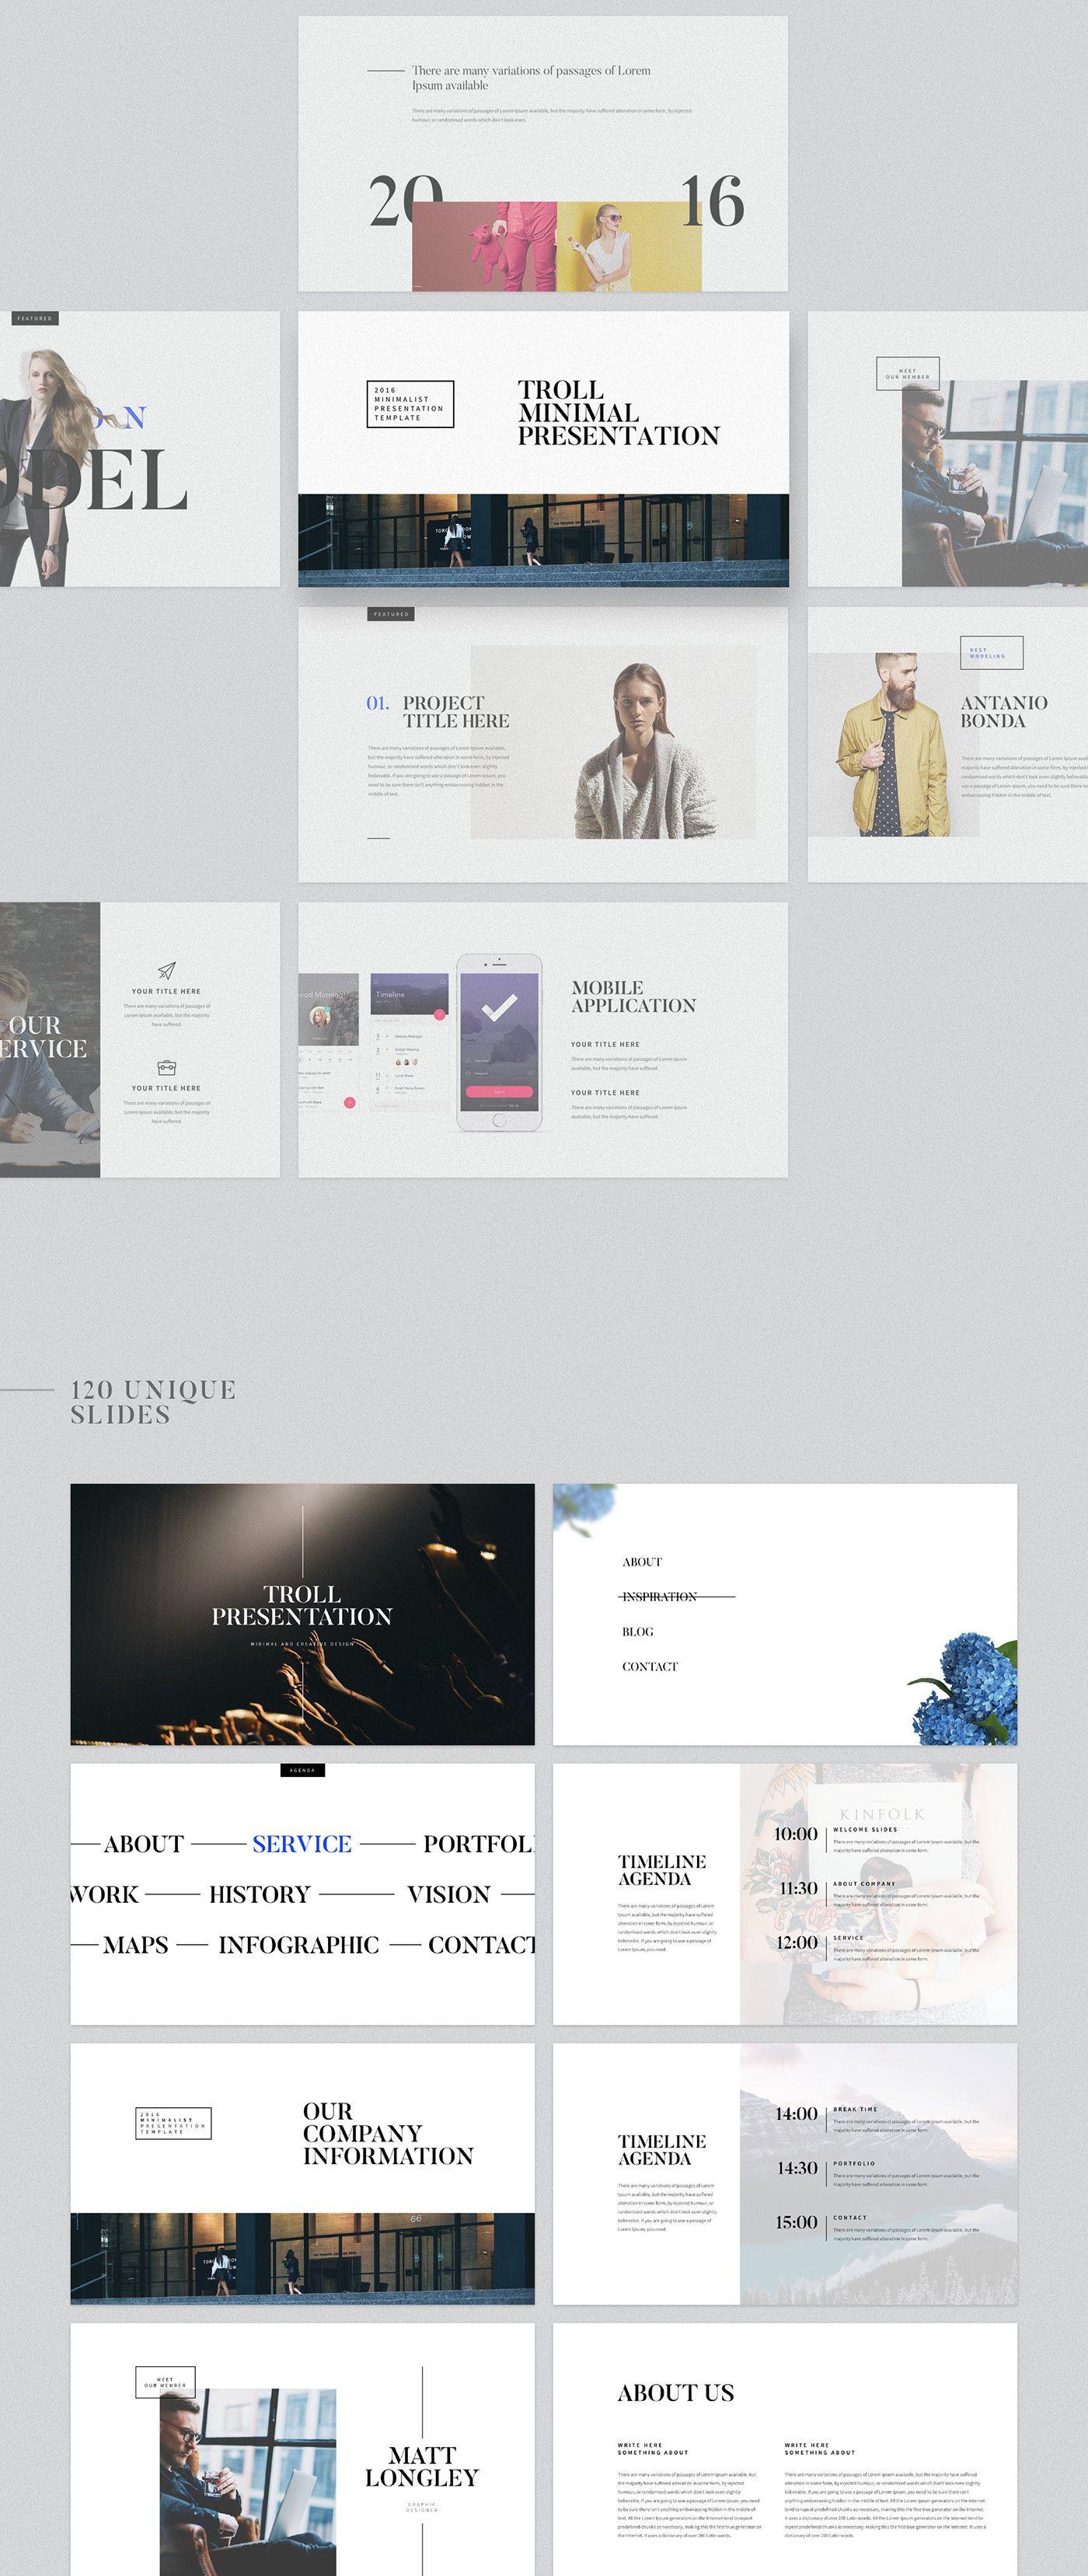 Troll - Presentation Template on Behance   Graphic design ...